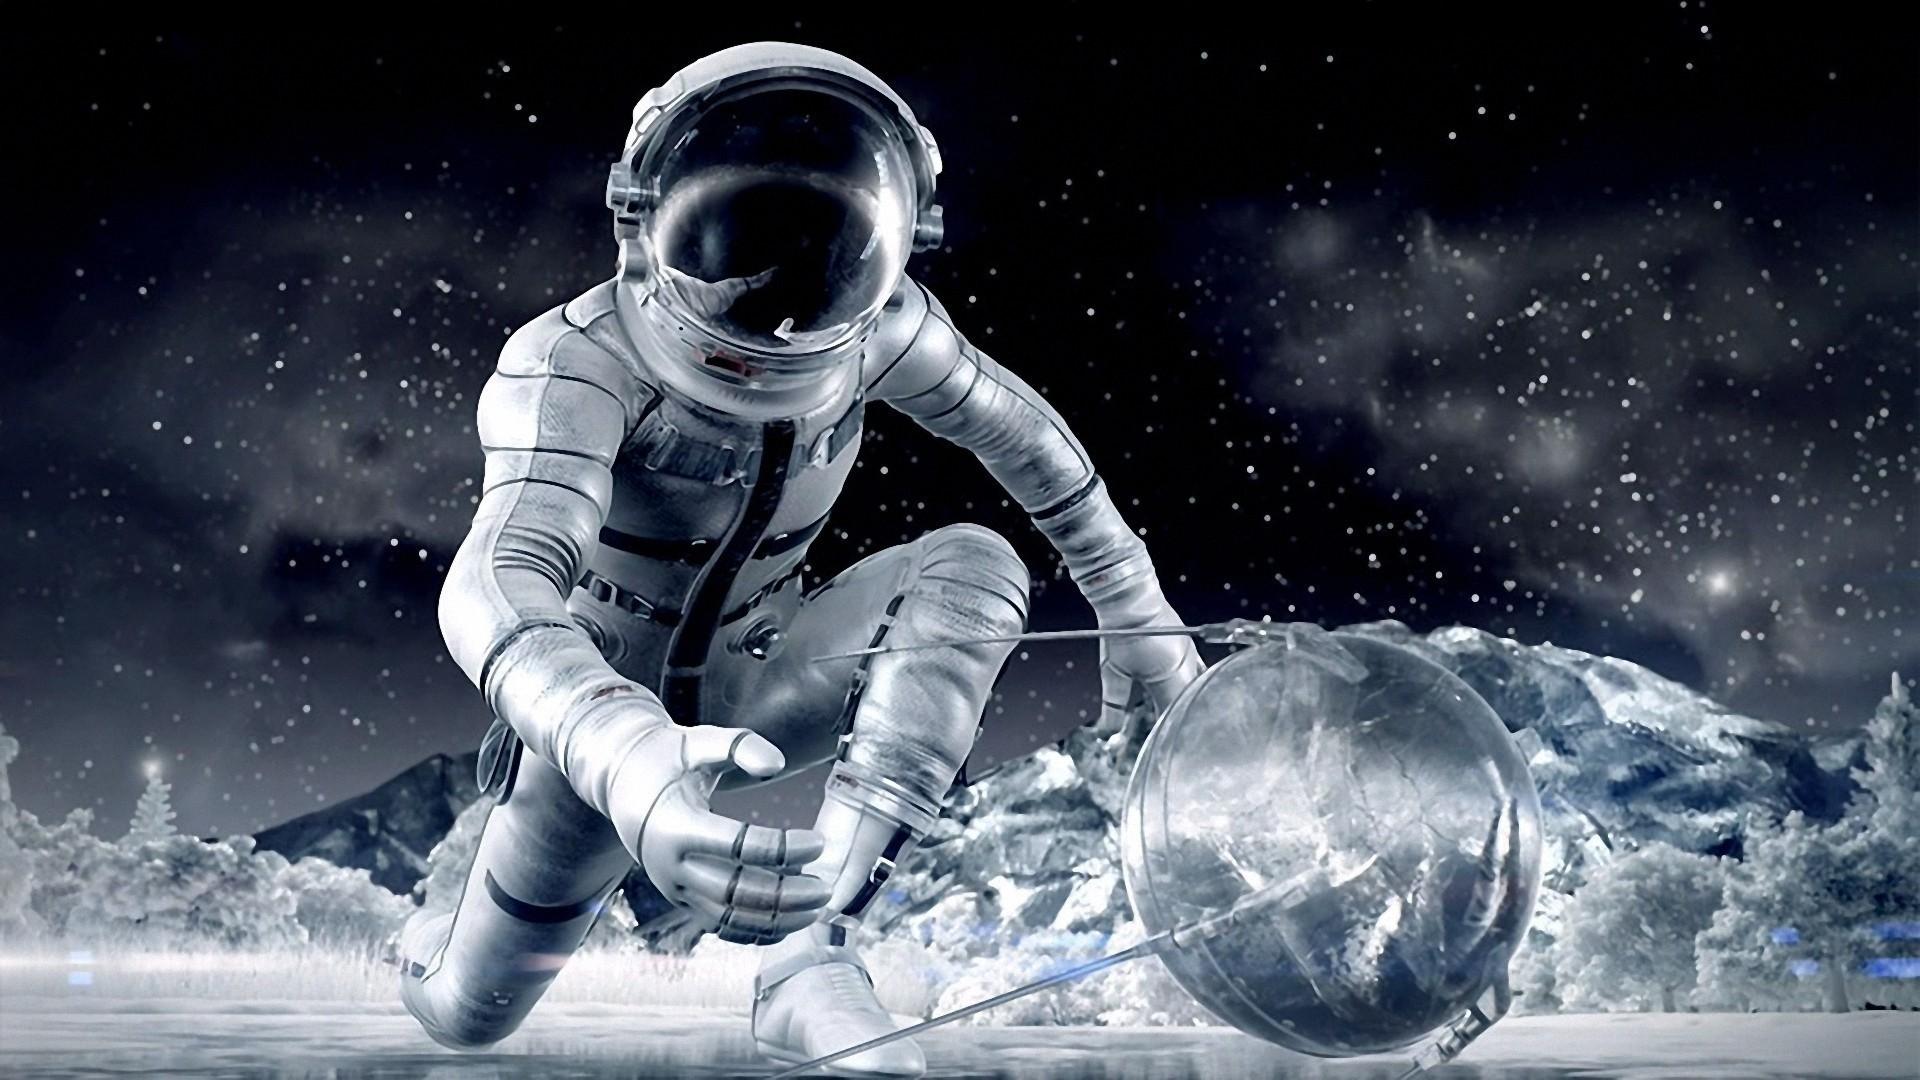 Astronaut PC Wallpaper HD